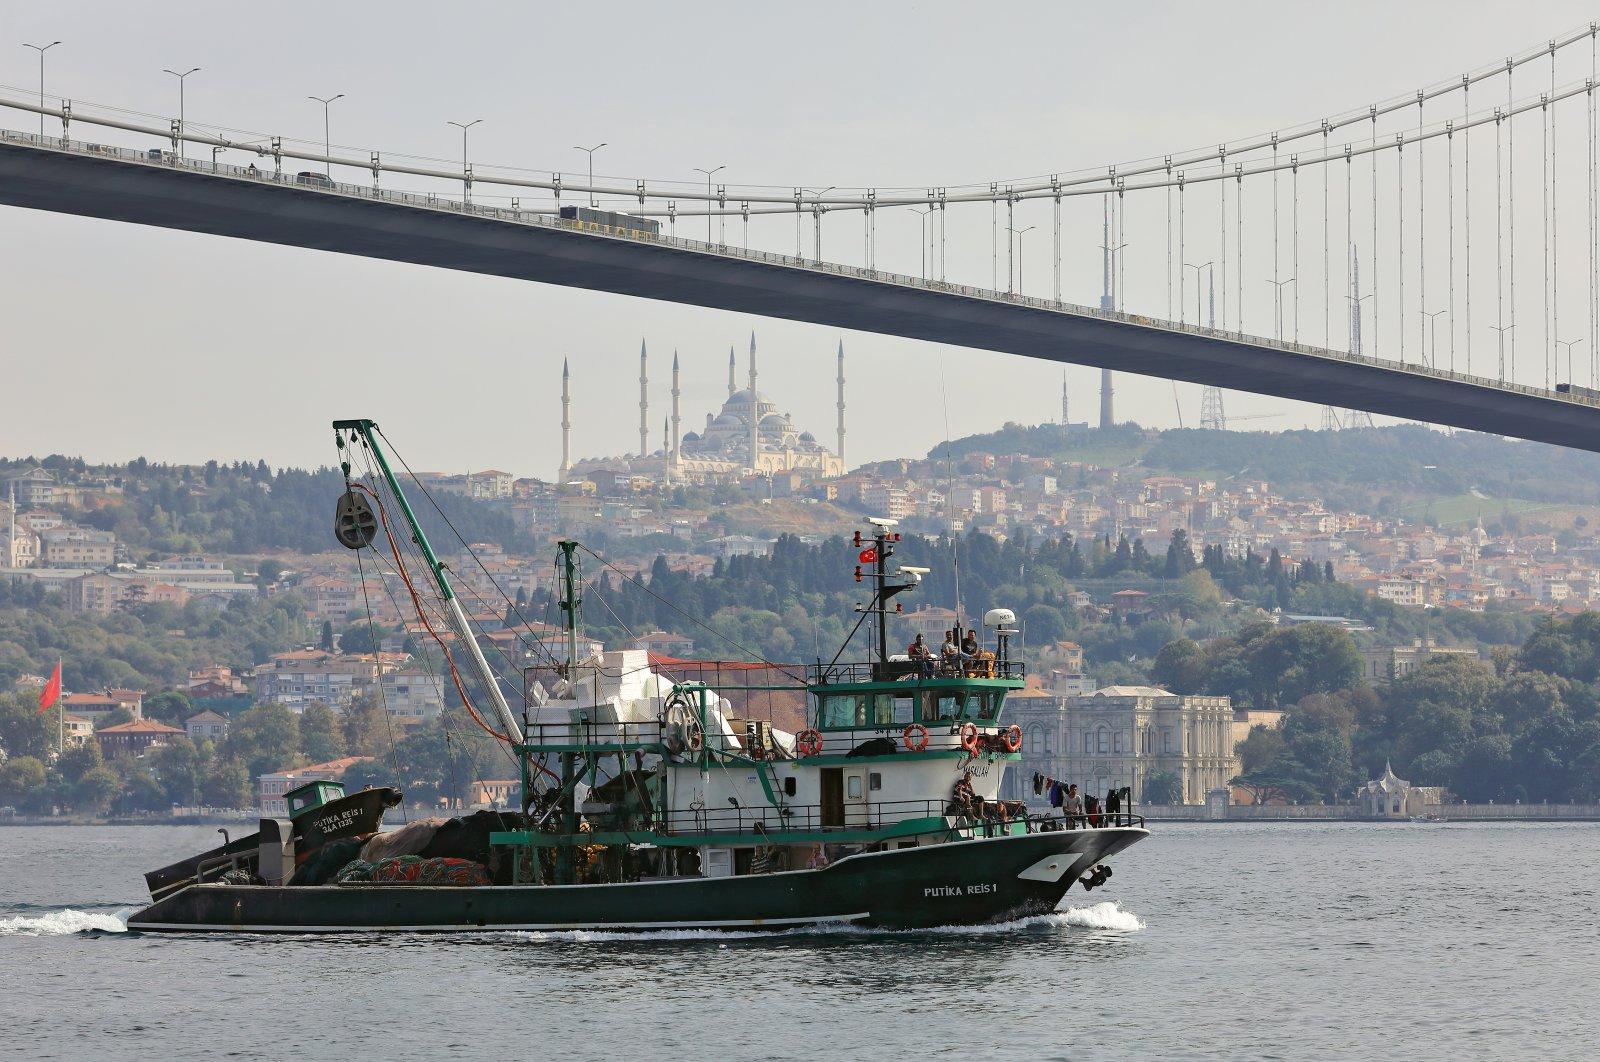 A fishing vessel sails under Bosphorus Bridge along the Bosphorus Strait, Istanbul, Turkey, Oct. 6, 2020. (Shutterstock Photo)